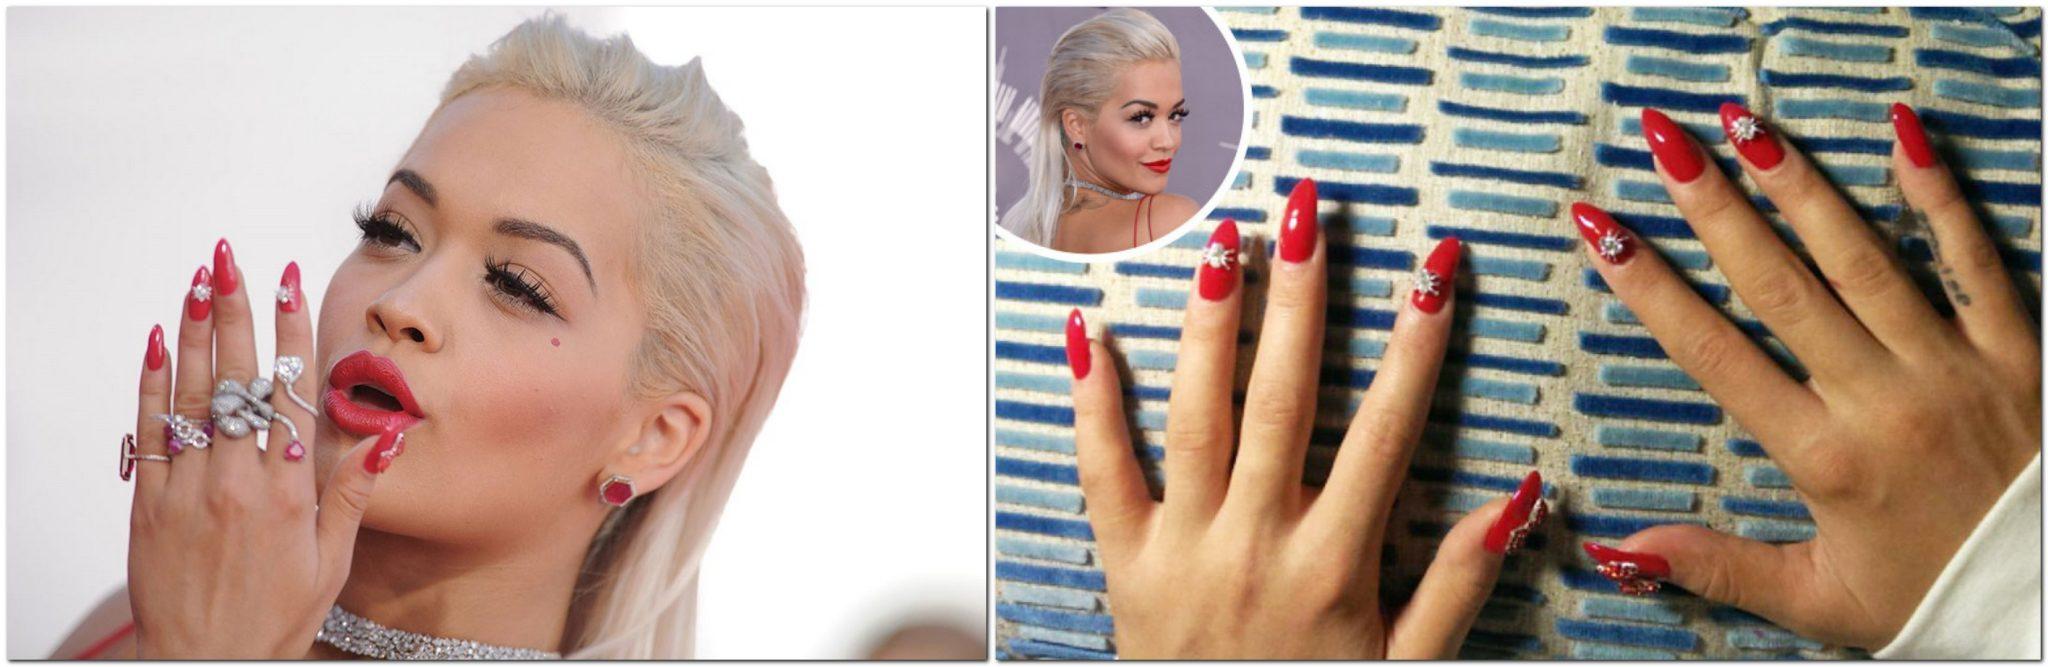 celebs-expensive-manicure-1-5